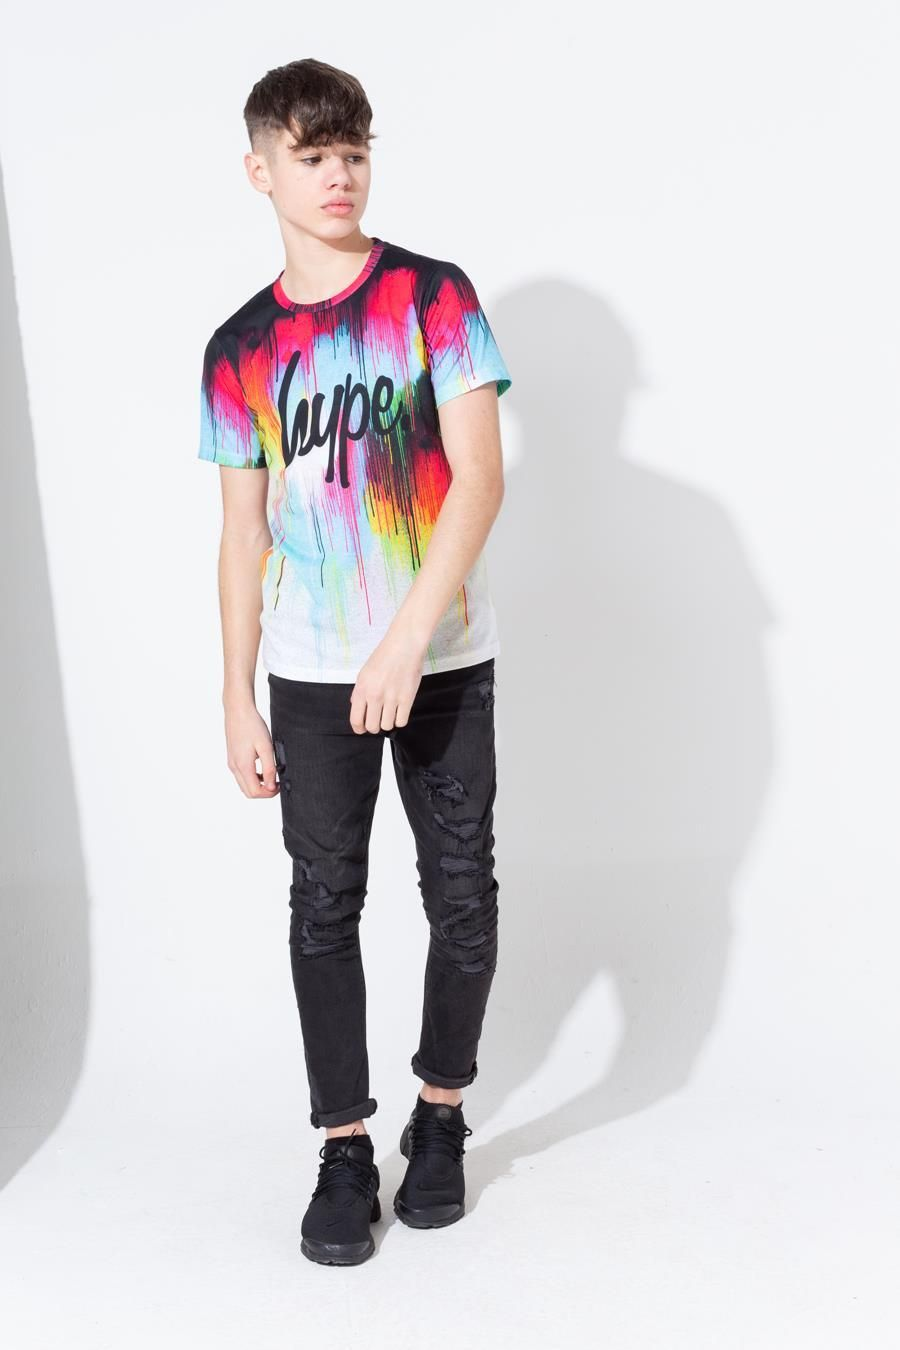 Hype Urban Drips Kids T-Shirt